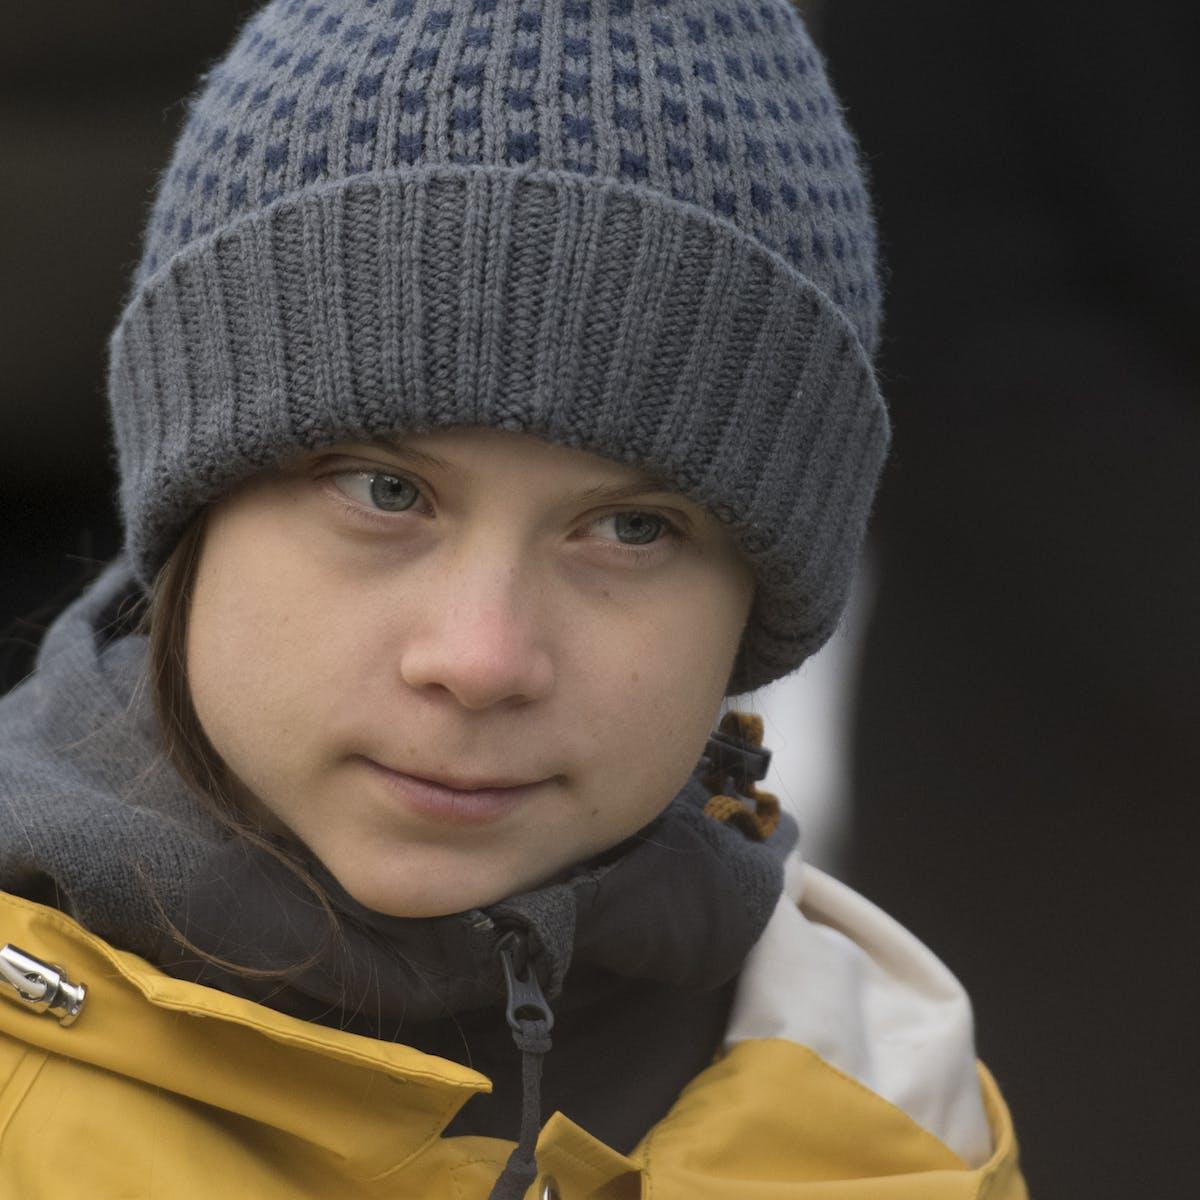 When talking about climate change, use Greta Thunberg's masterful method